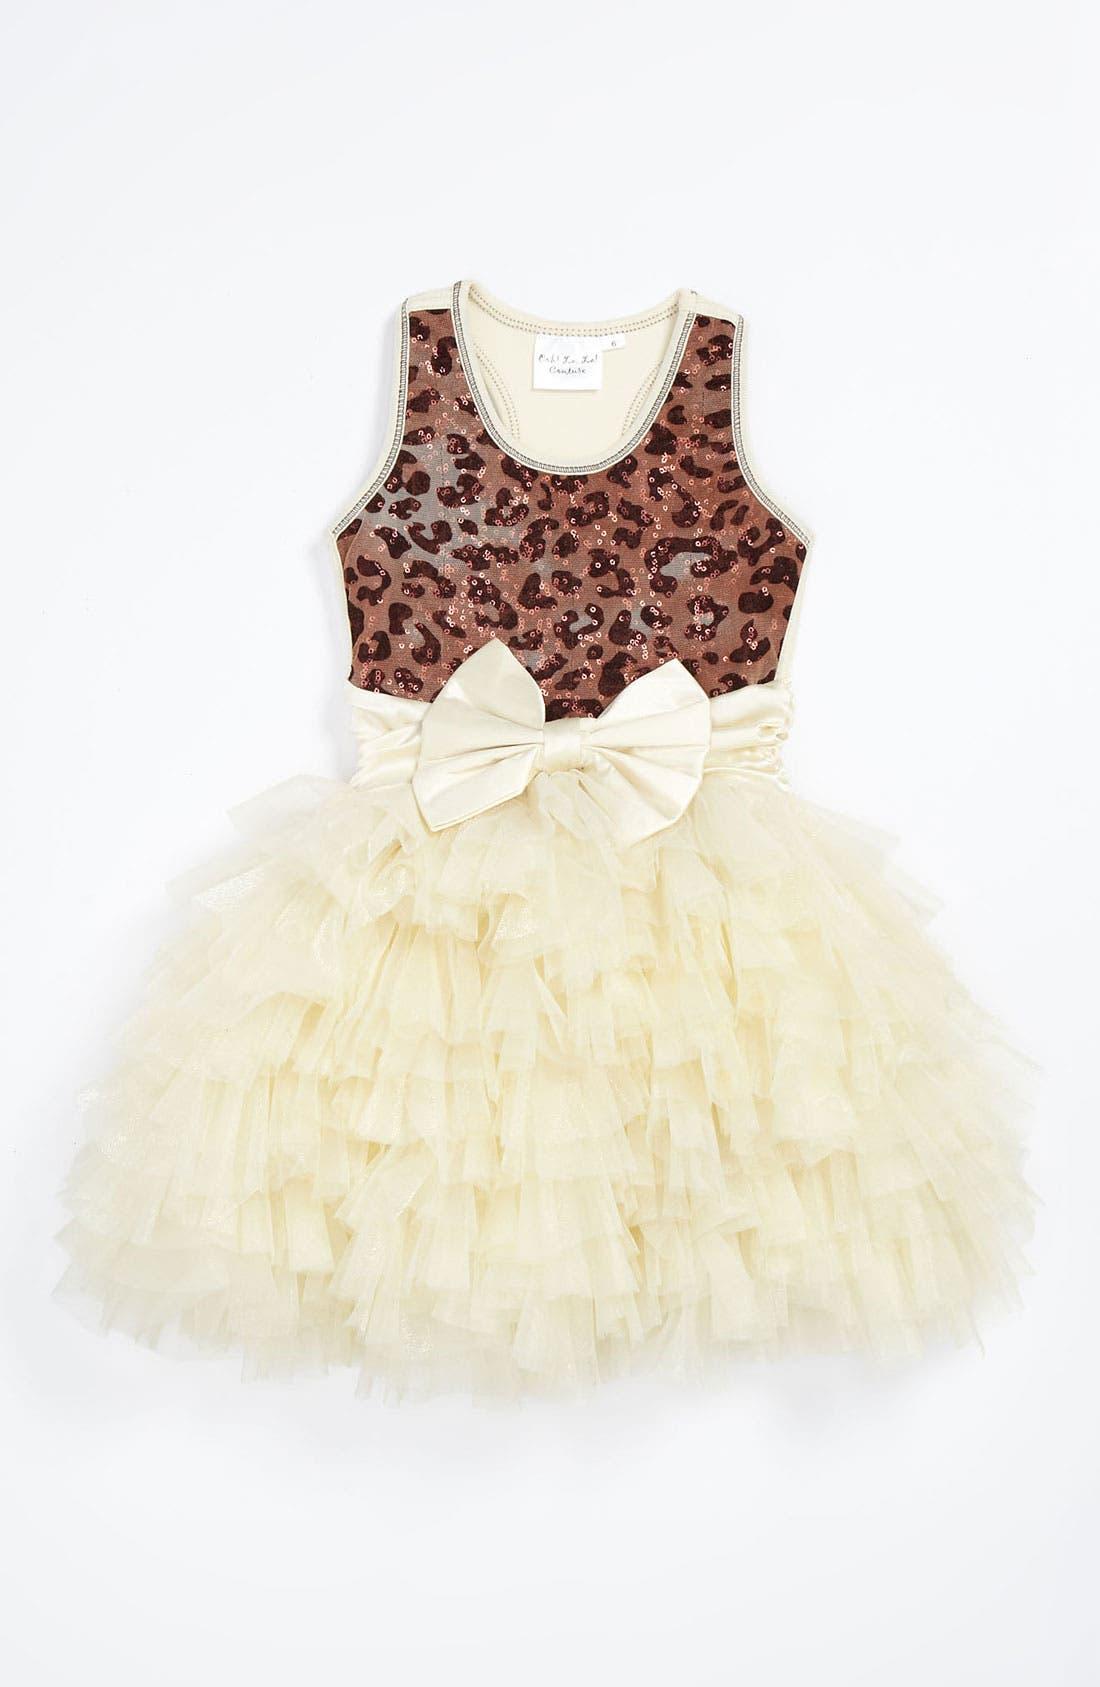 Alternate Image 1 Selected - Ooh! La, La! Couture 'Dream' Leopard Bodice Dress (Little Girls)